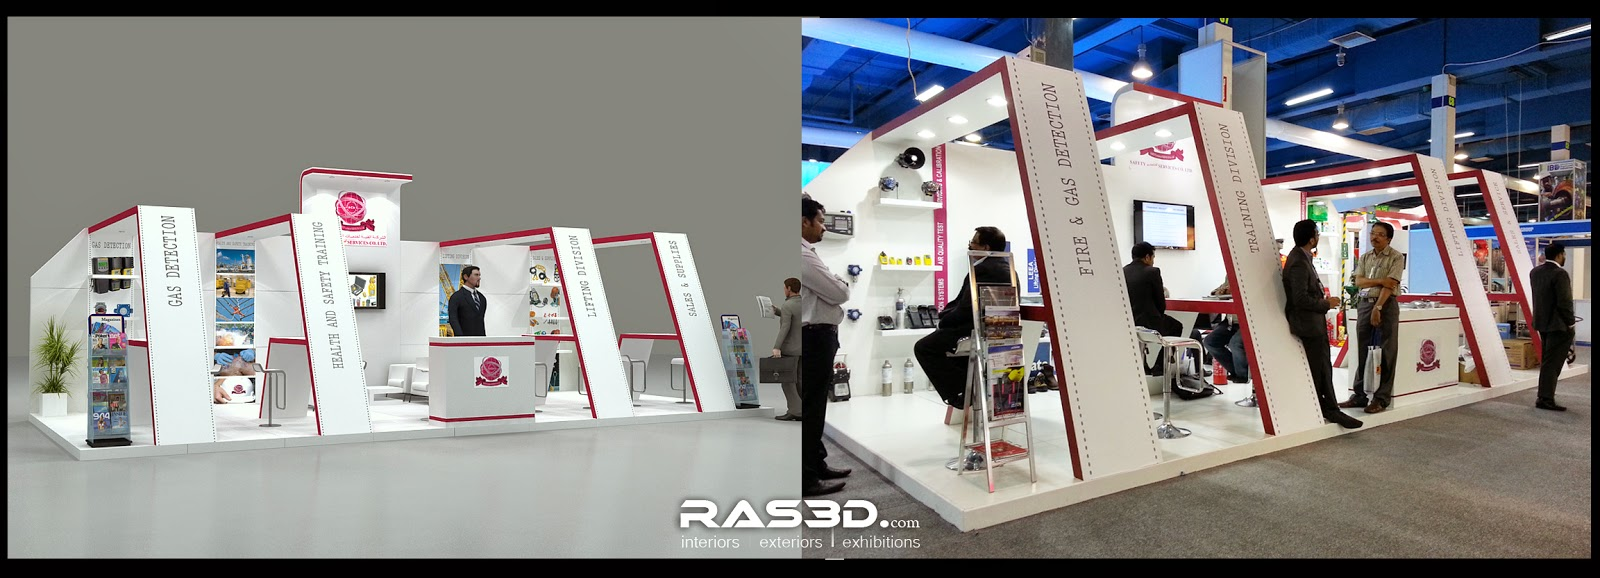 Marketing Exhibition Stand Qatar : D designer visualizer events exhibitions interiors